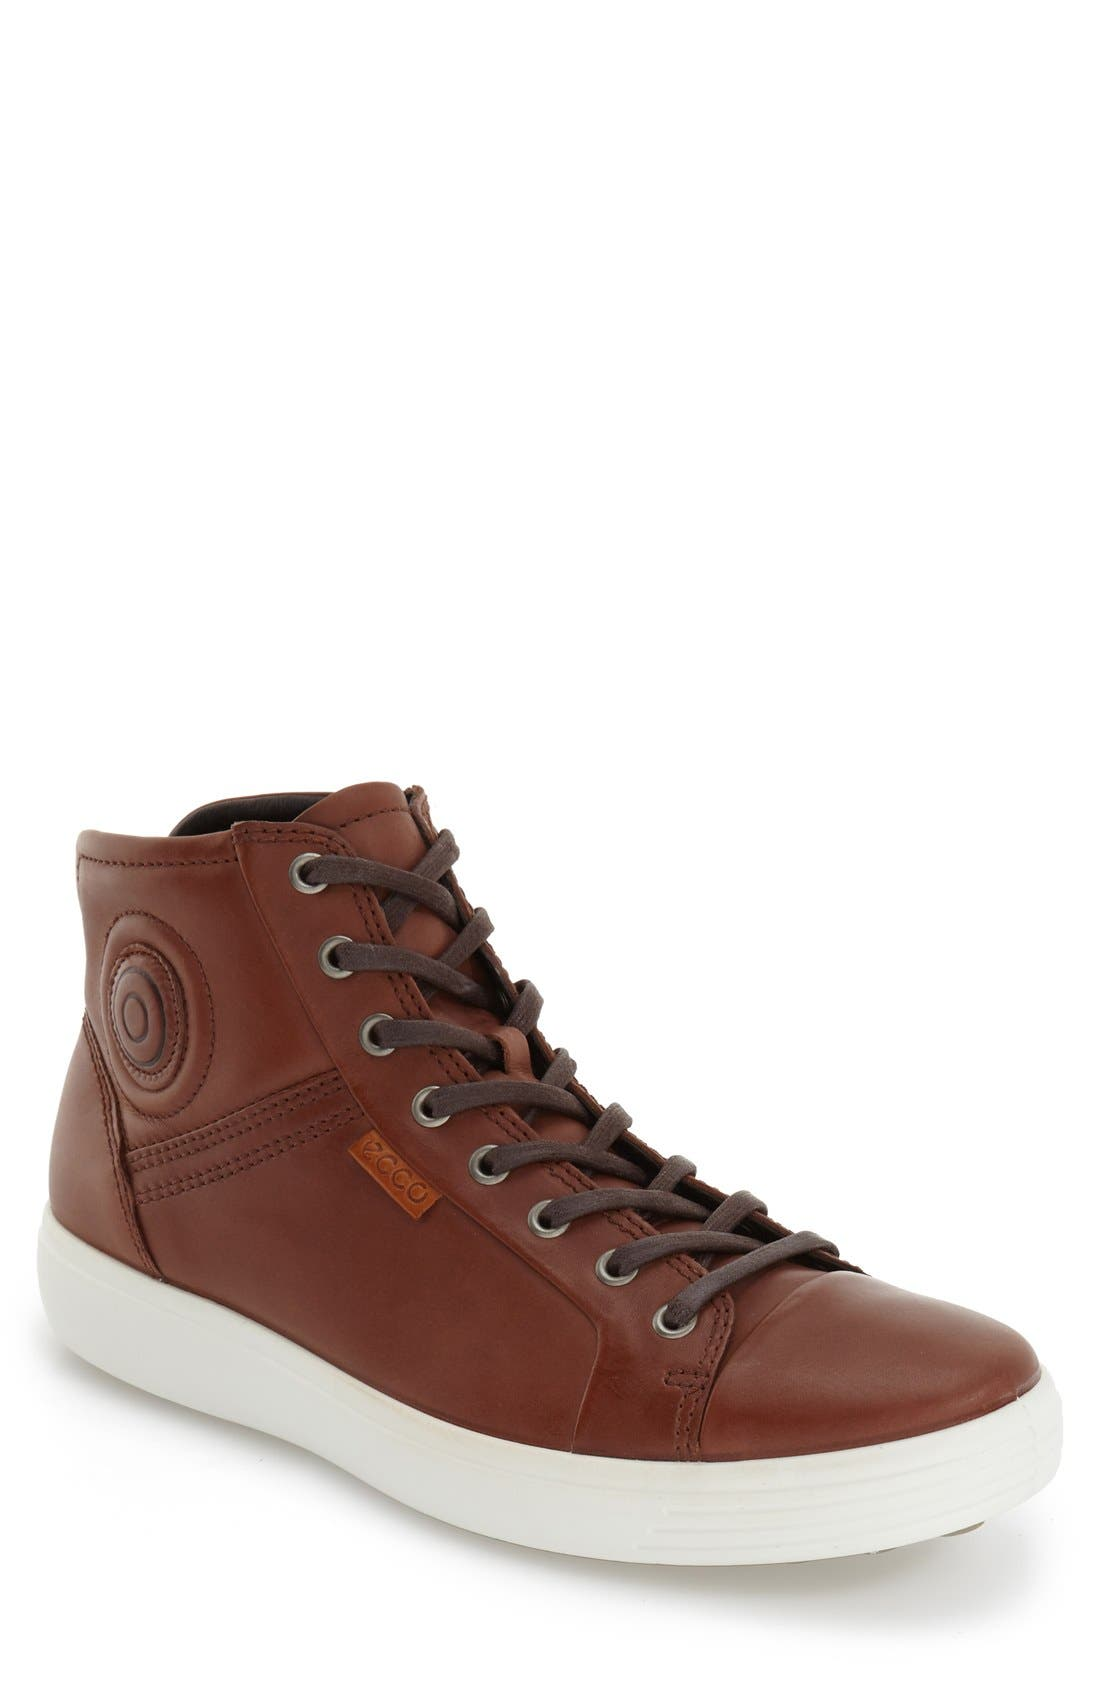 Main Image - ECCO 'Soft 7' High Top Sneaker (Men)